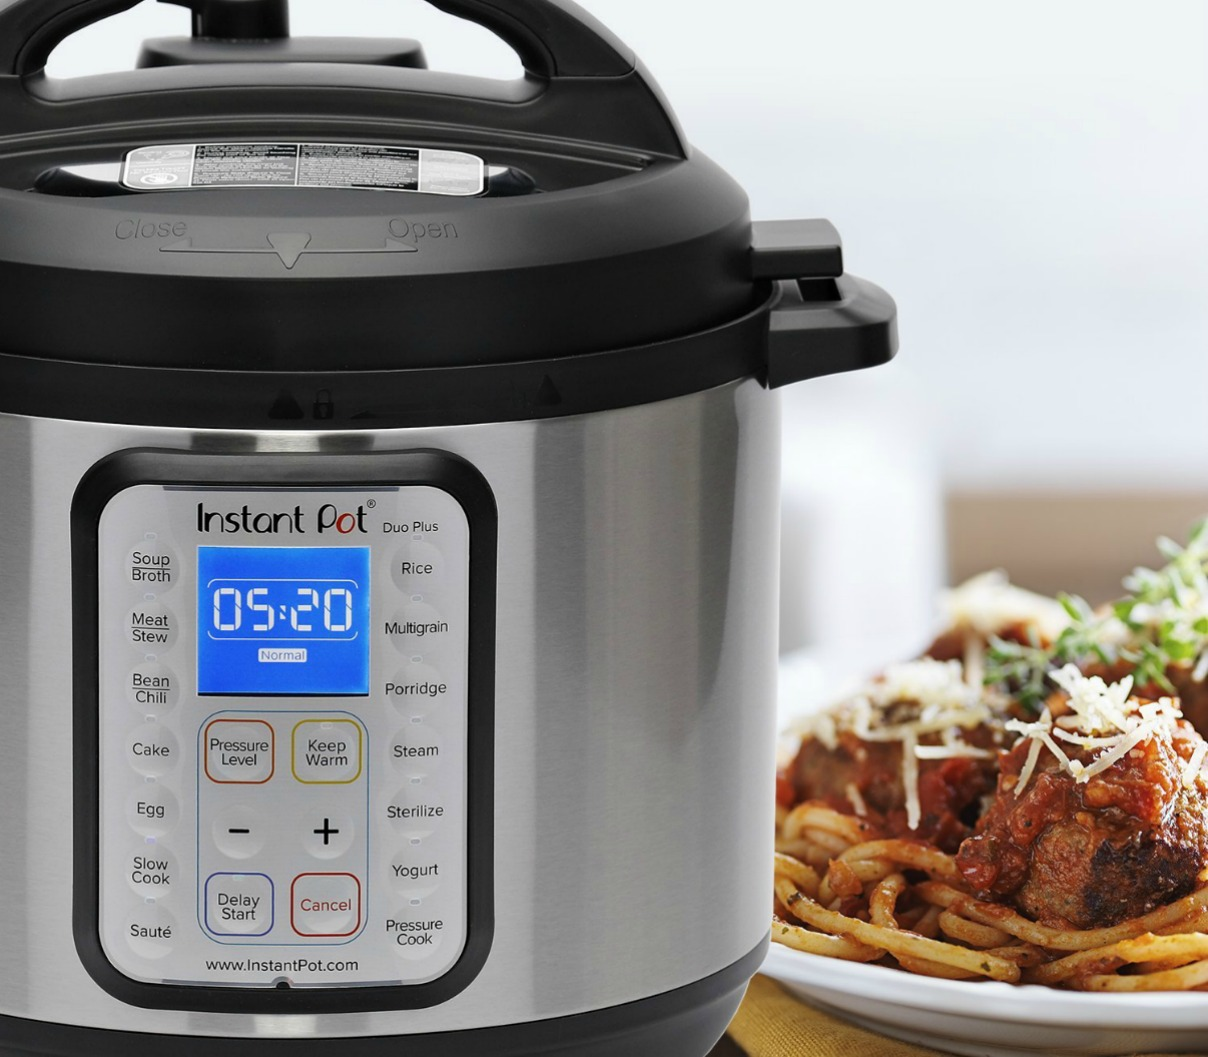 Instant Pot Duo Plus 8-Quart Pressure Cooker Only $97.99